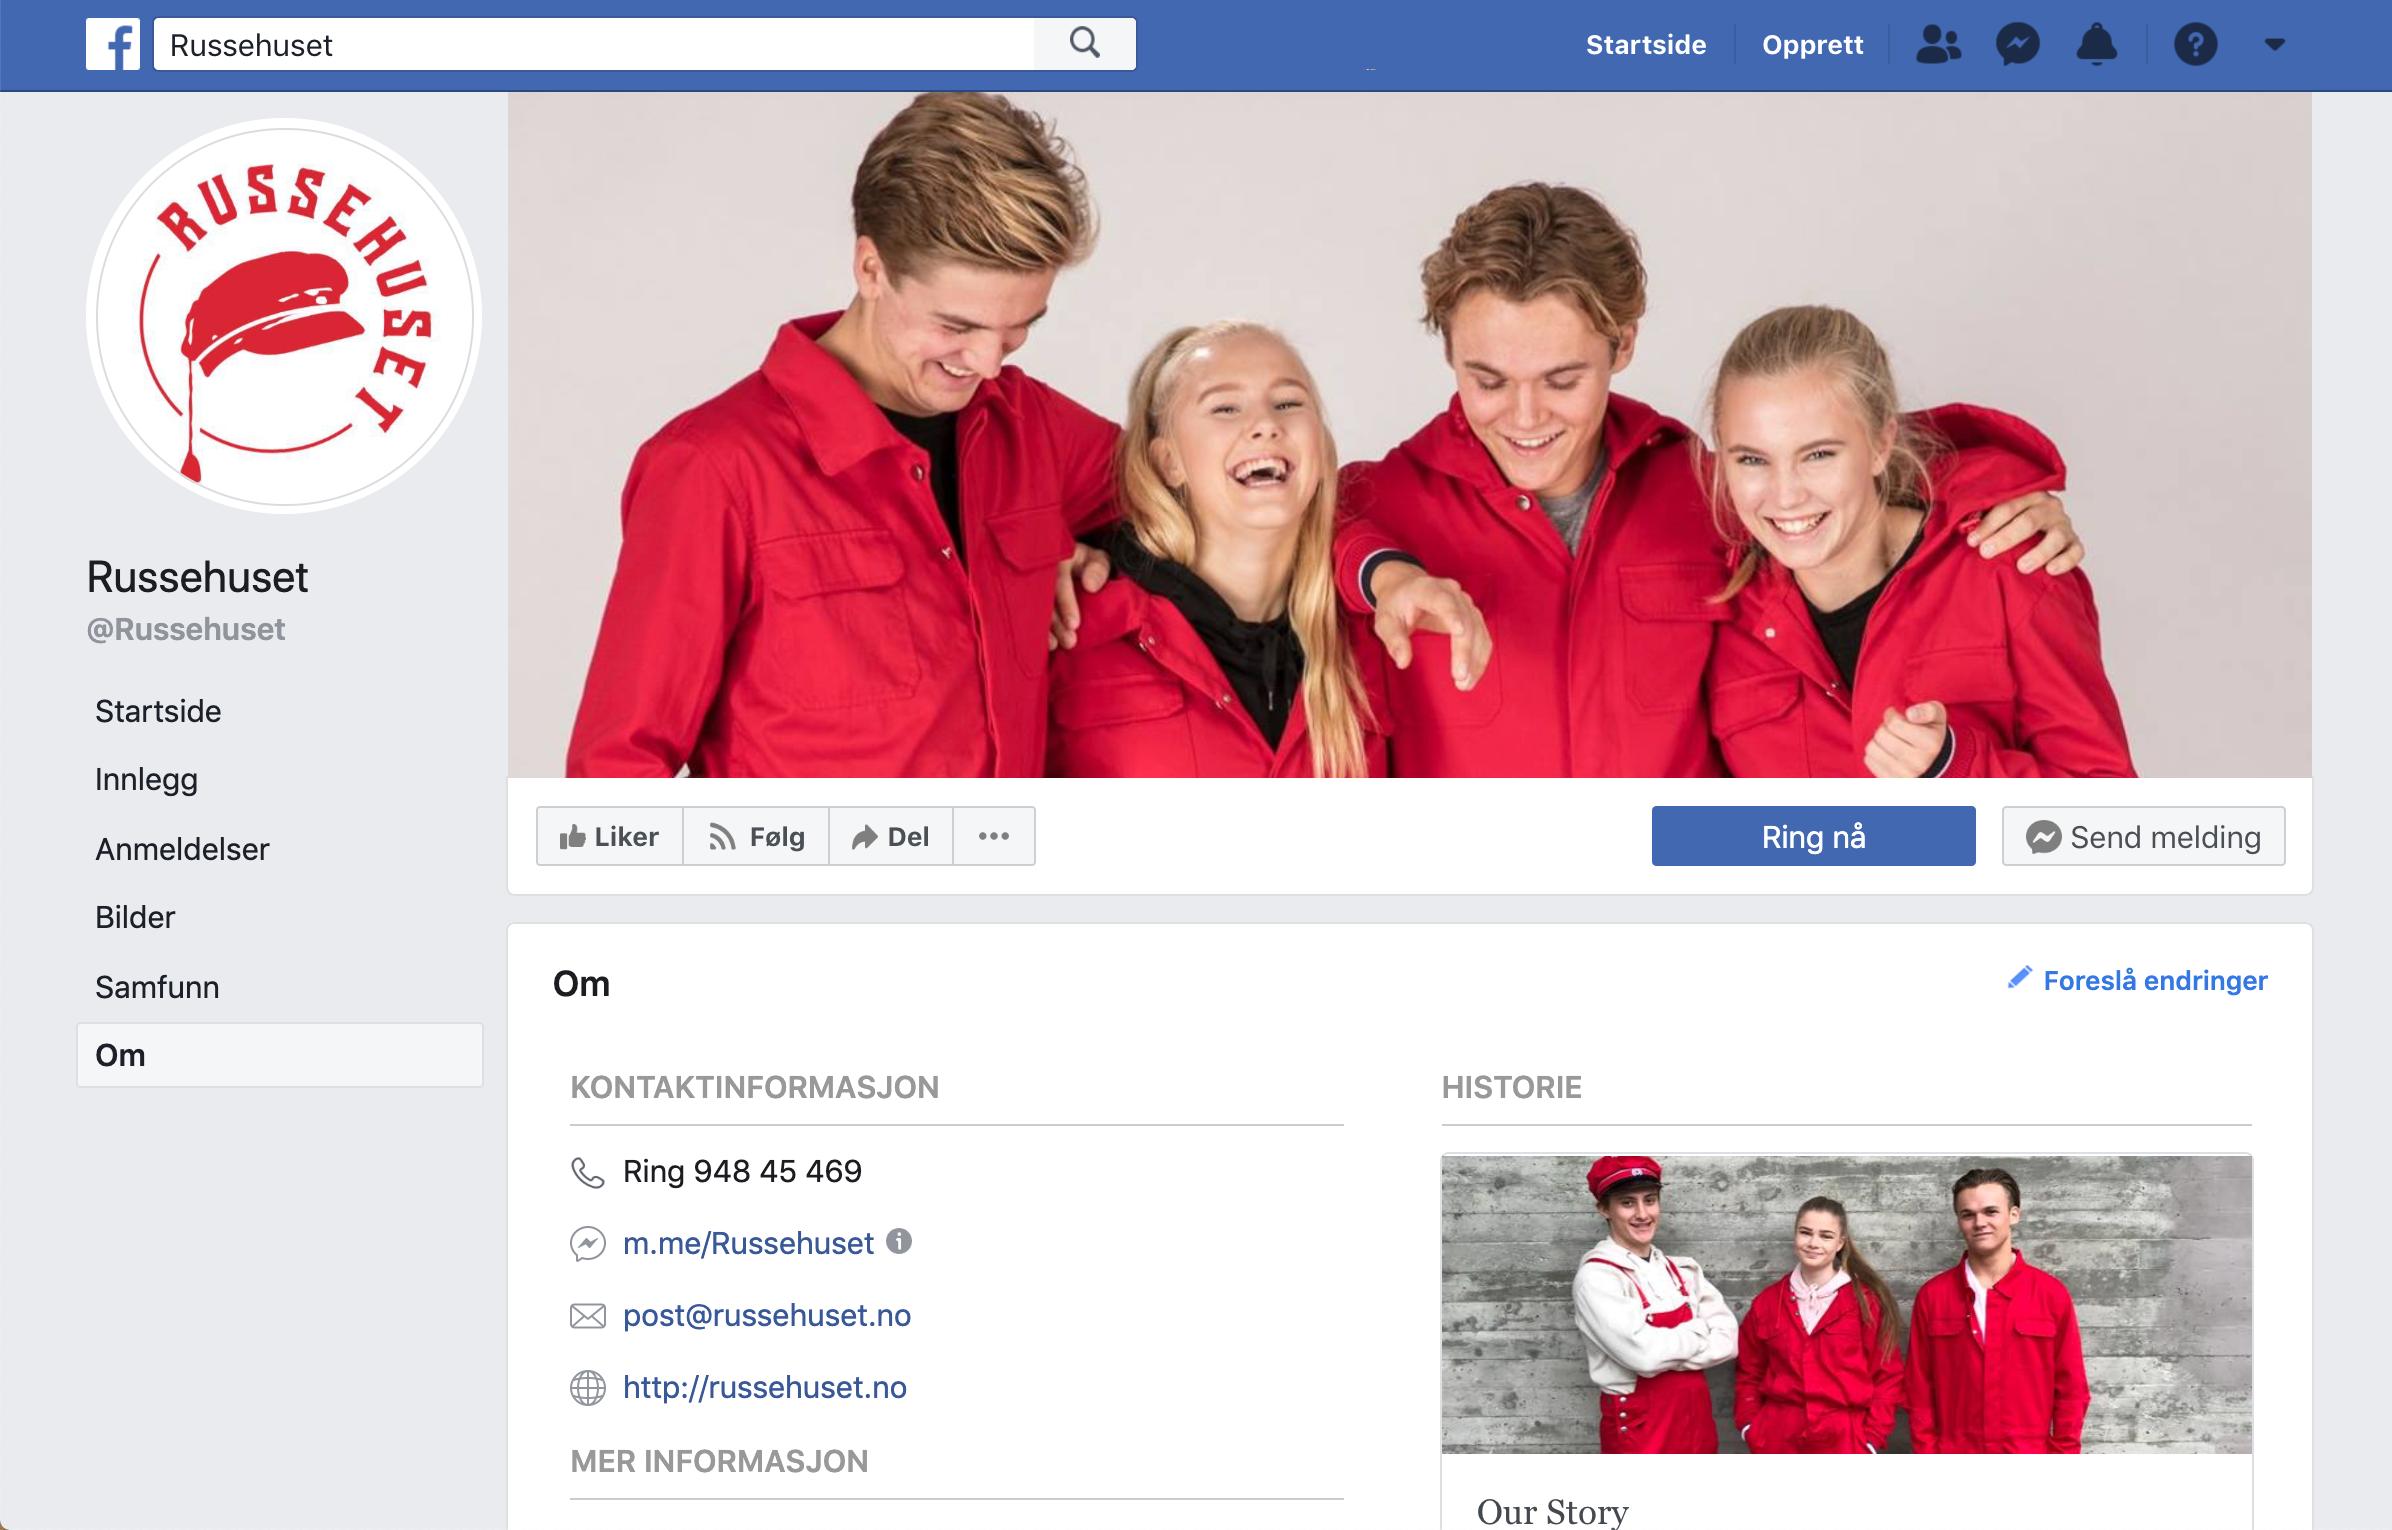 Medieuttrykk og mediesamfunnet Vg2 og Vg3 - Markedsføring på Facebook - NDLA